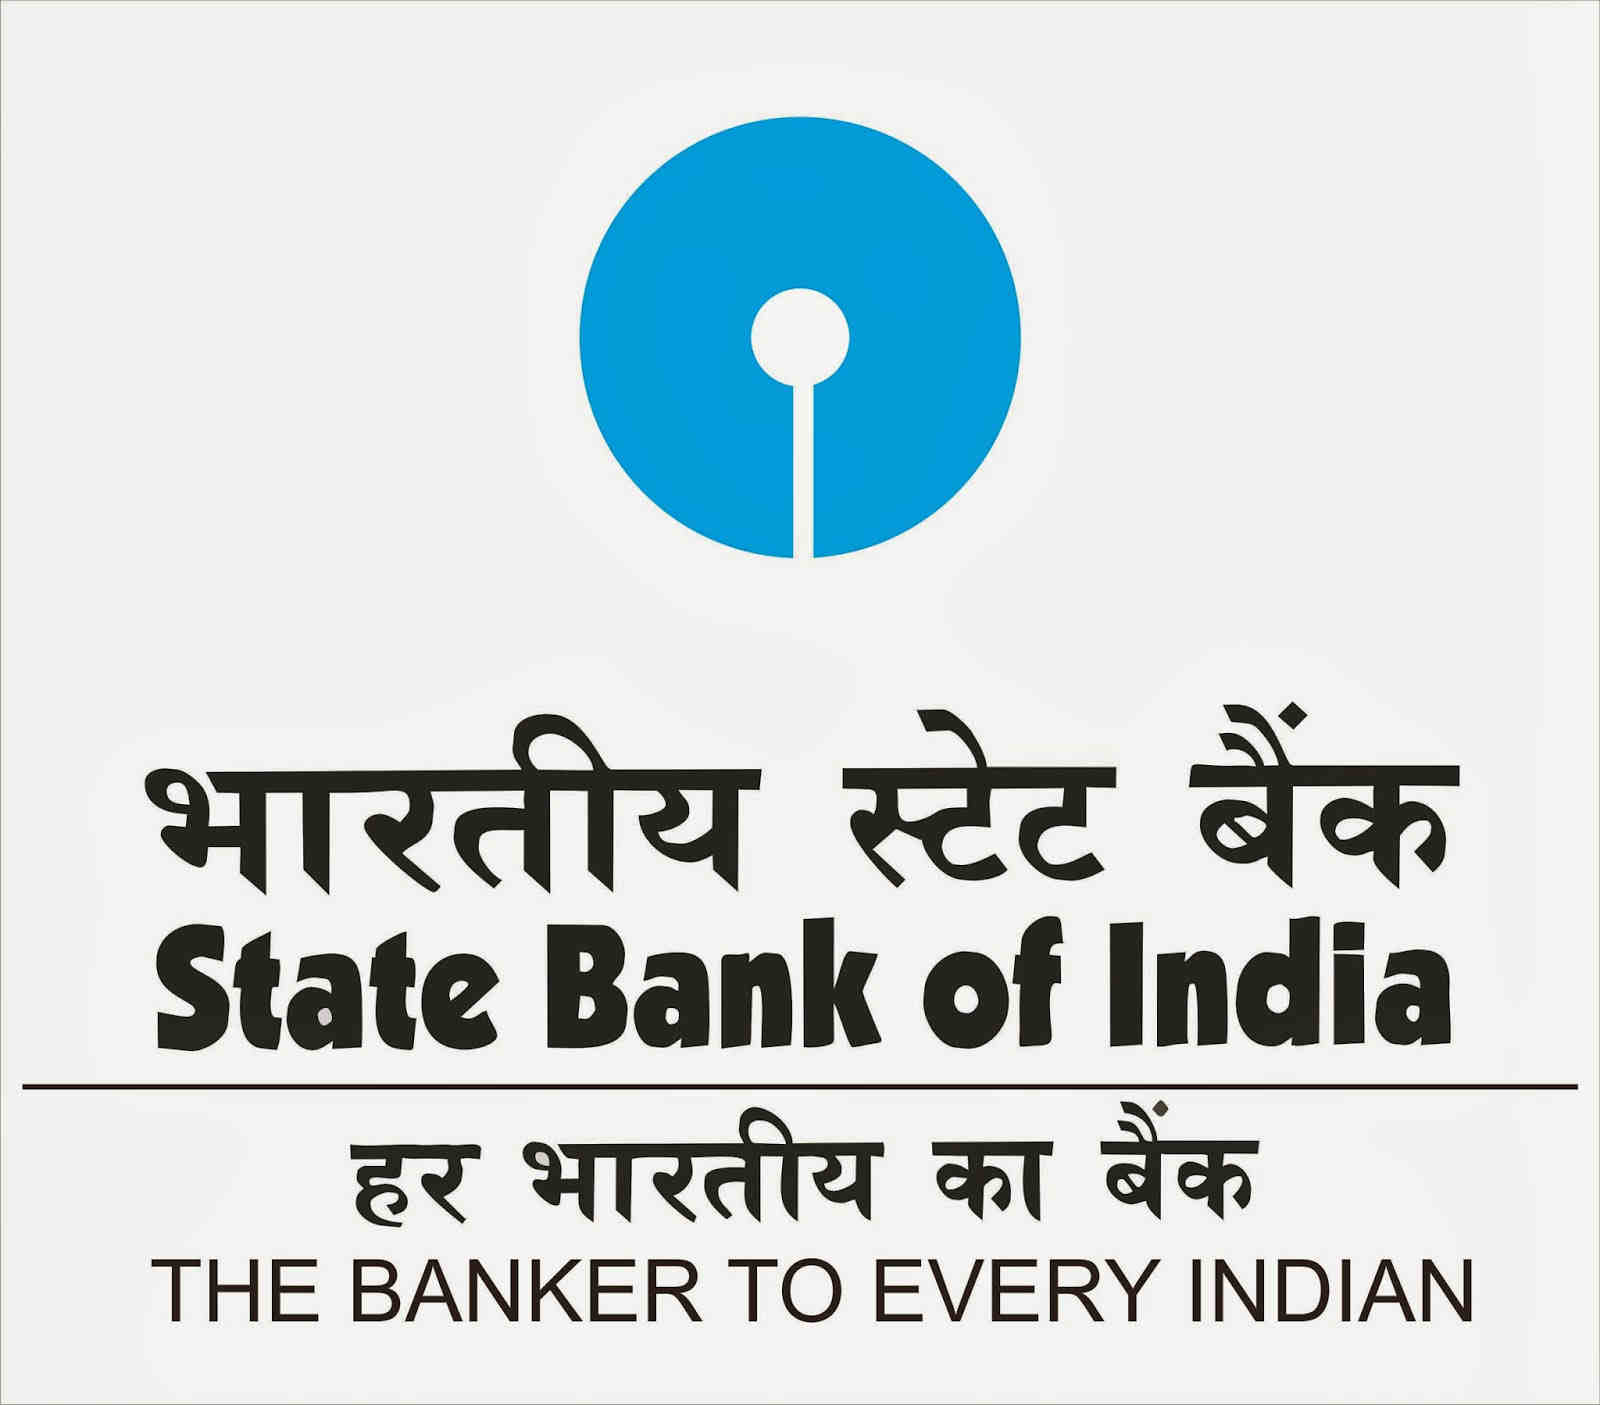 State Bank Of India takes loan of 100 million euros